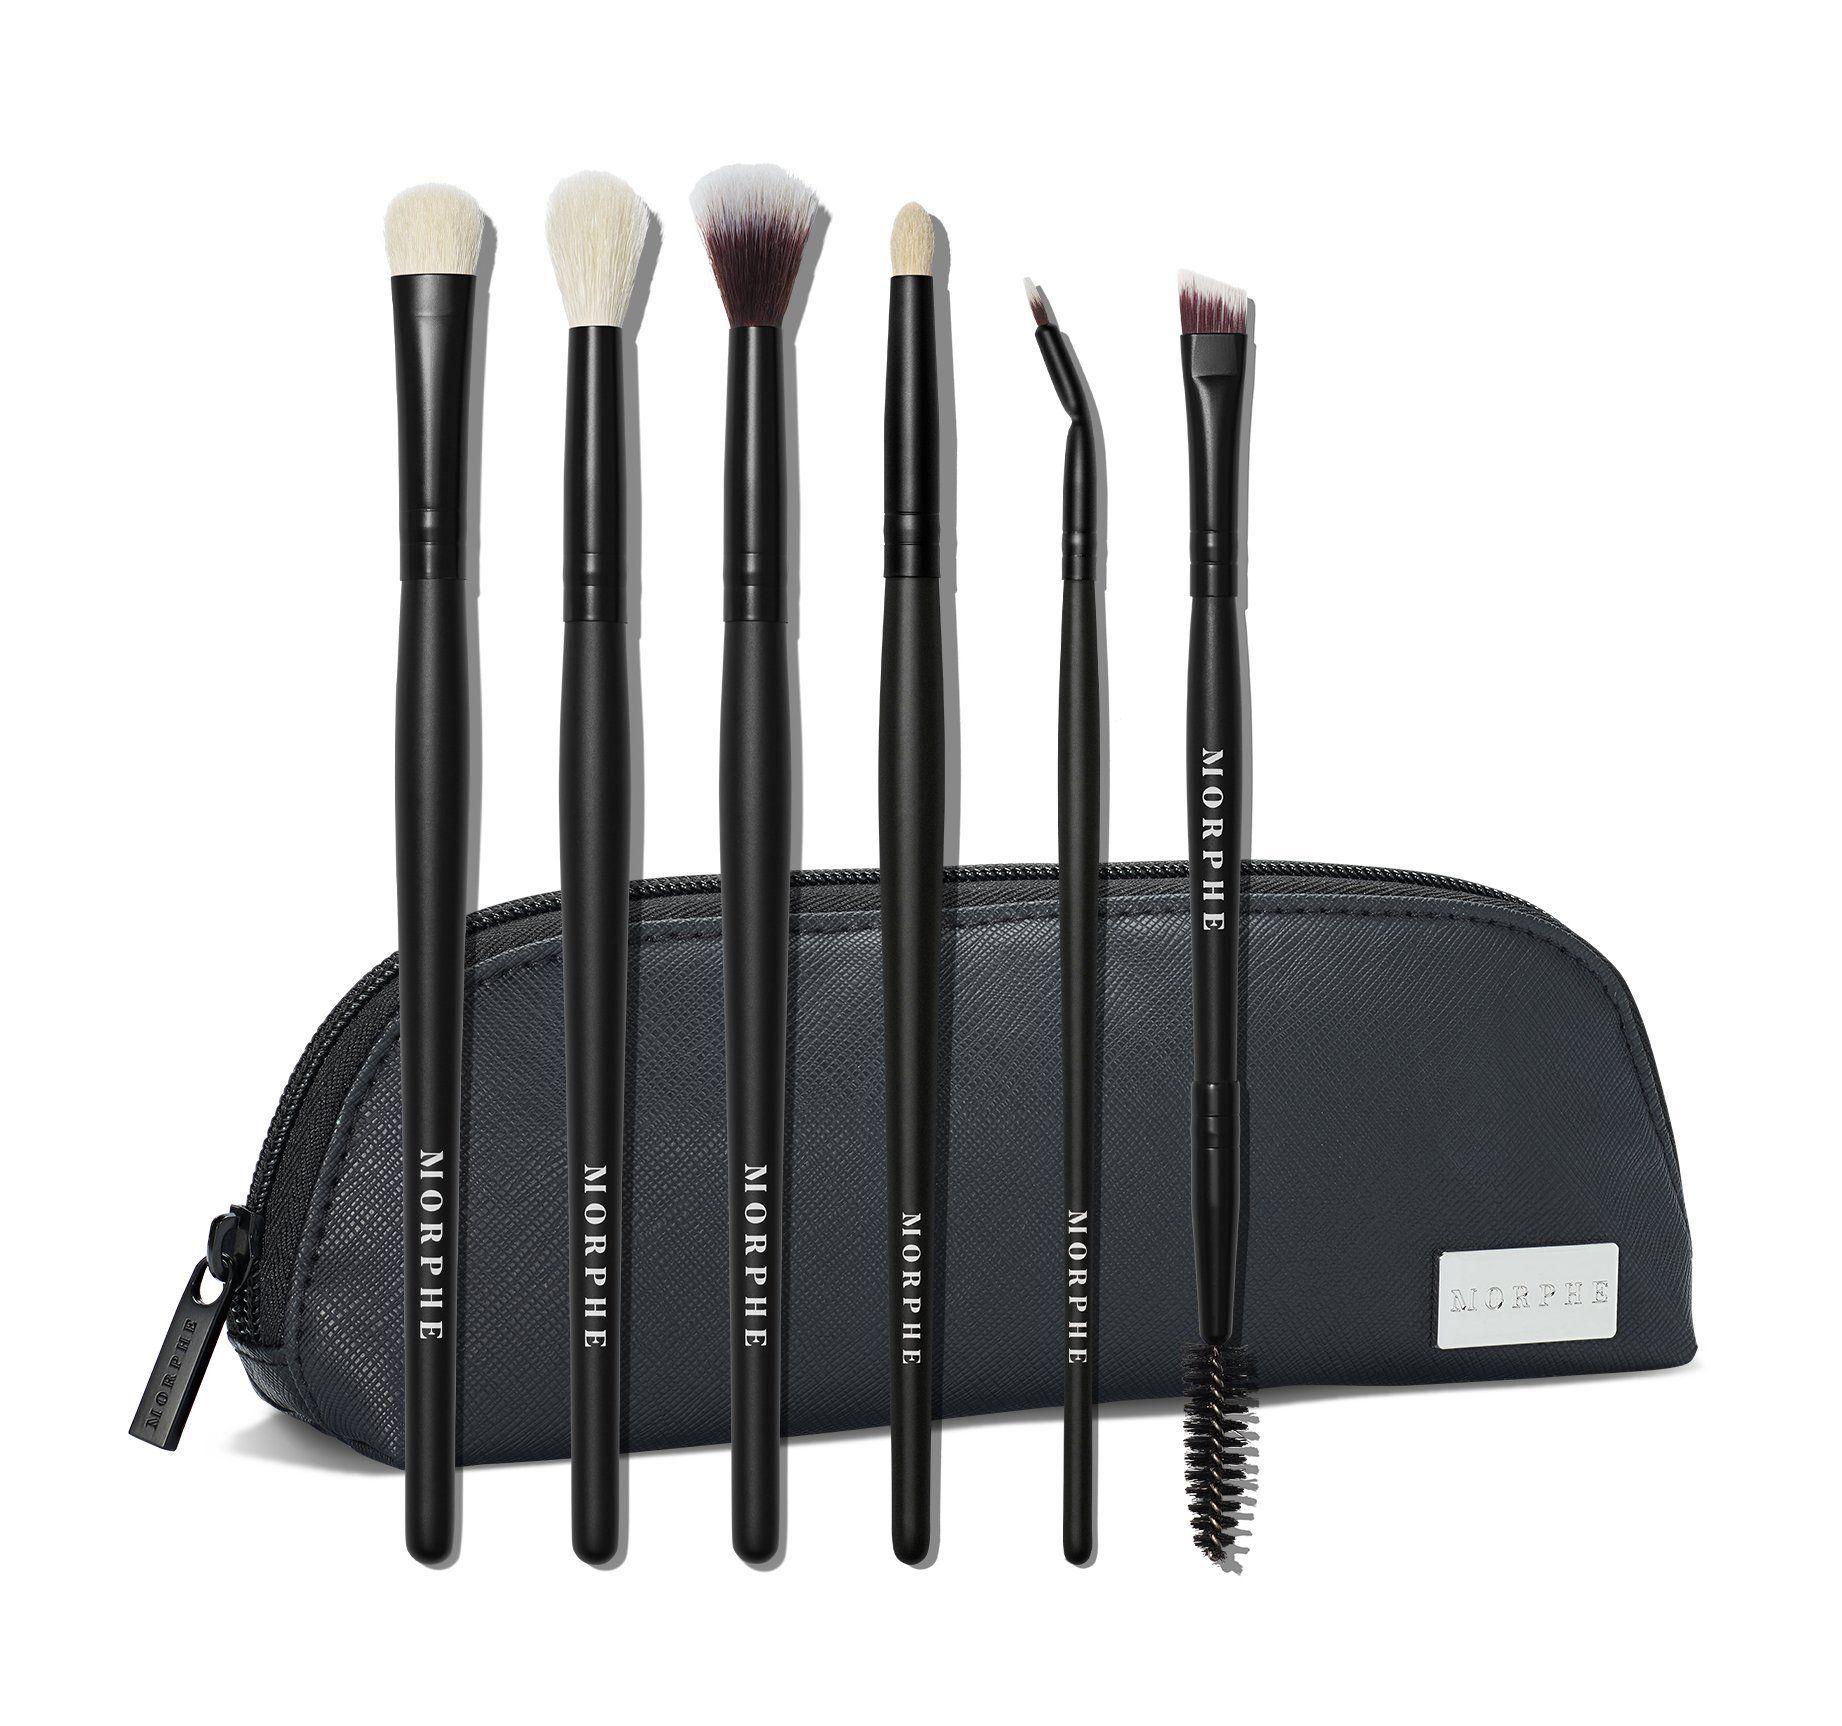 Morphe Eye Stunners Brush Collection in 2020 Eye brushes